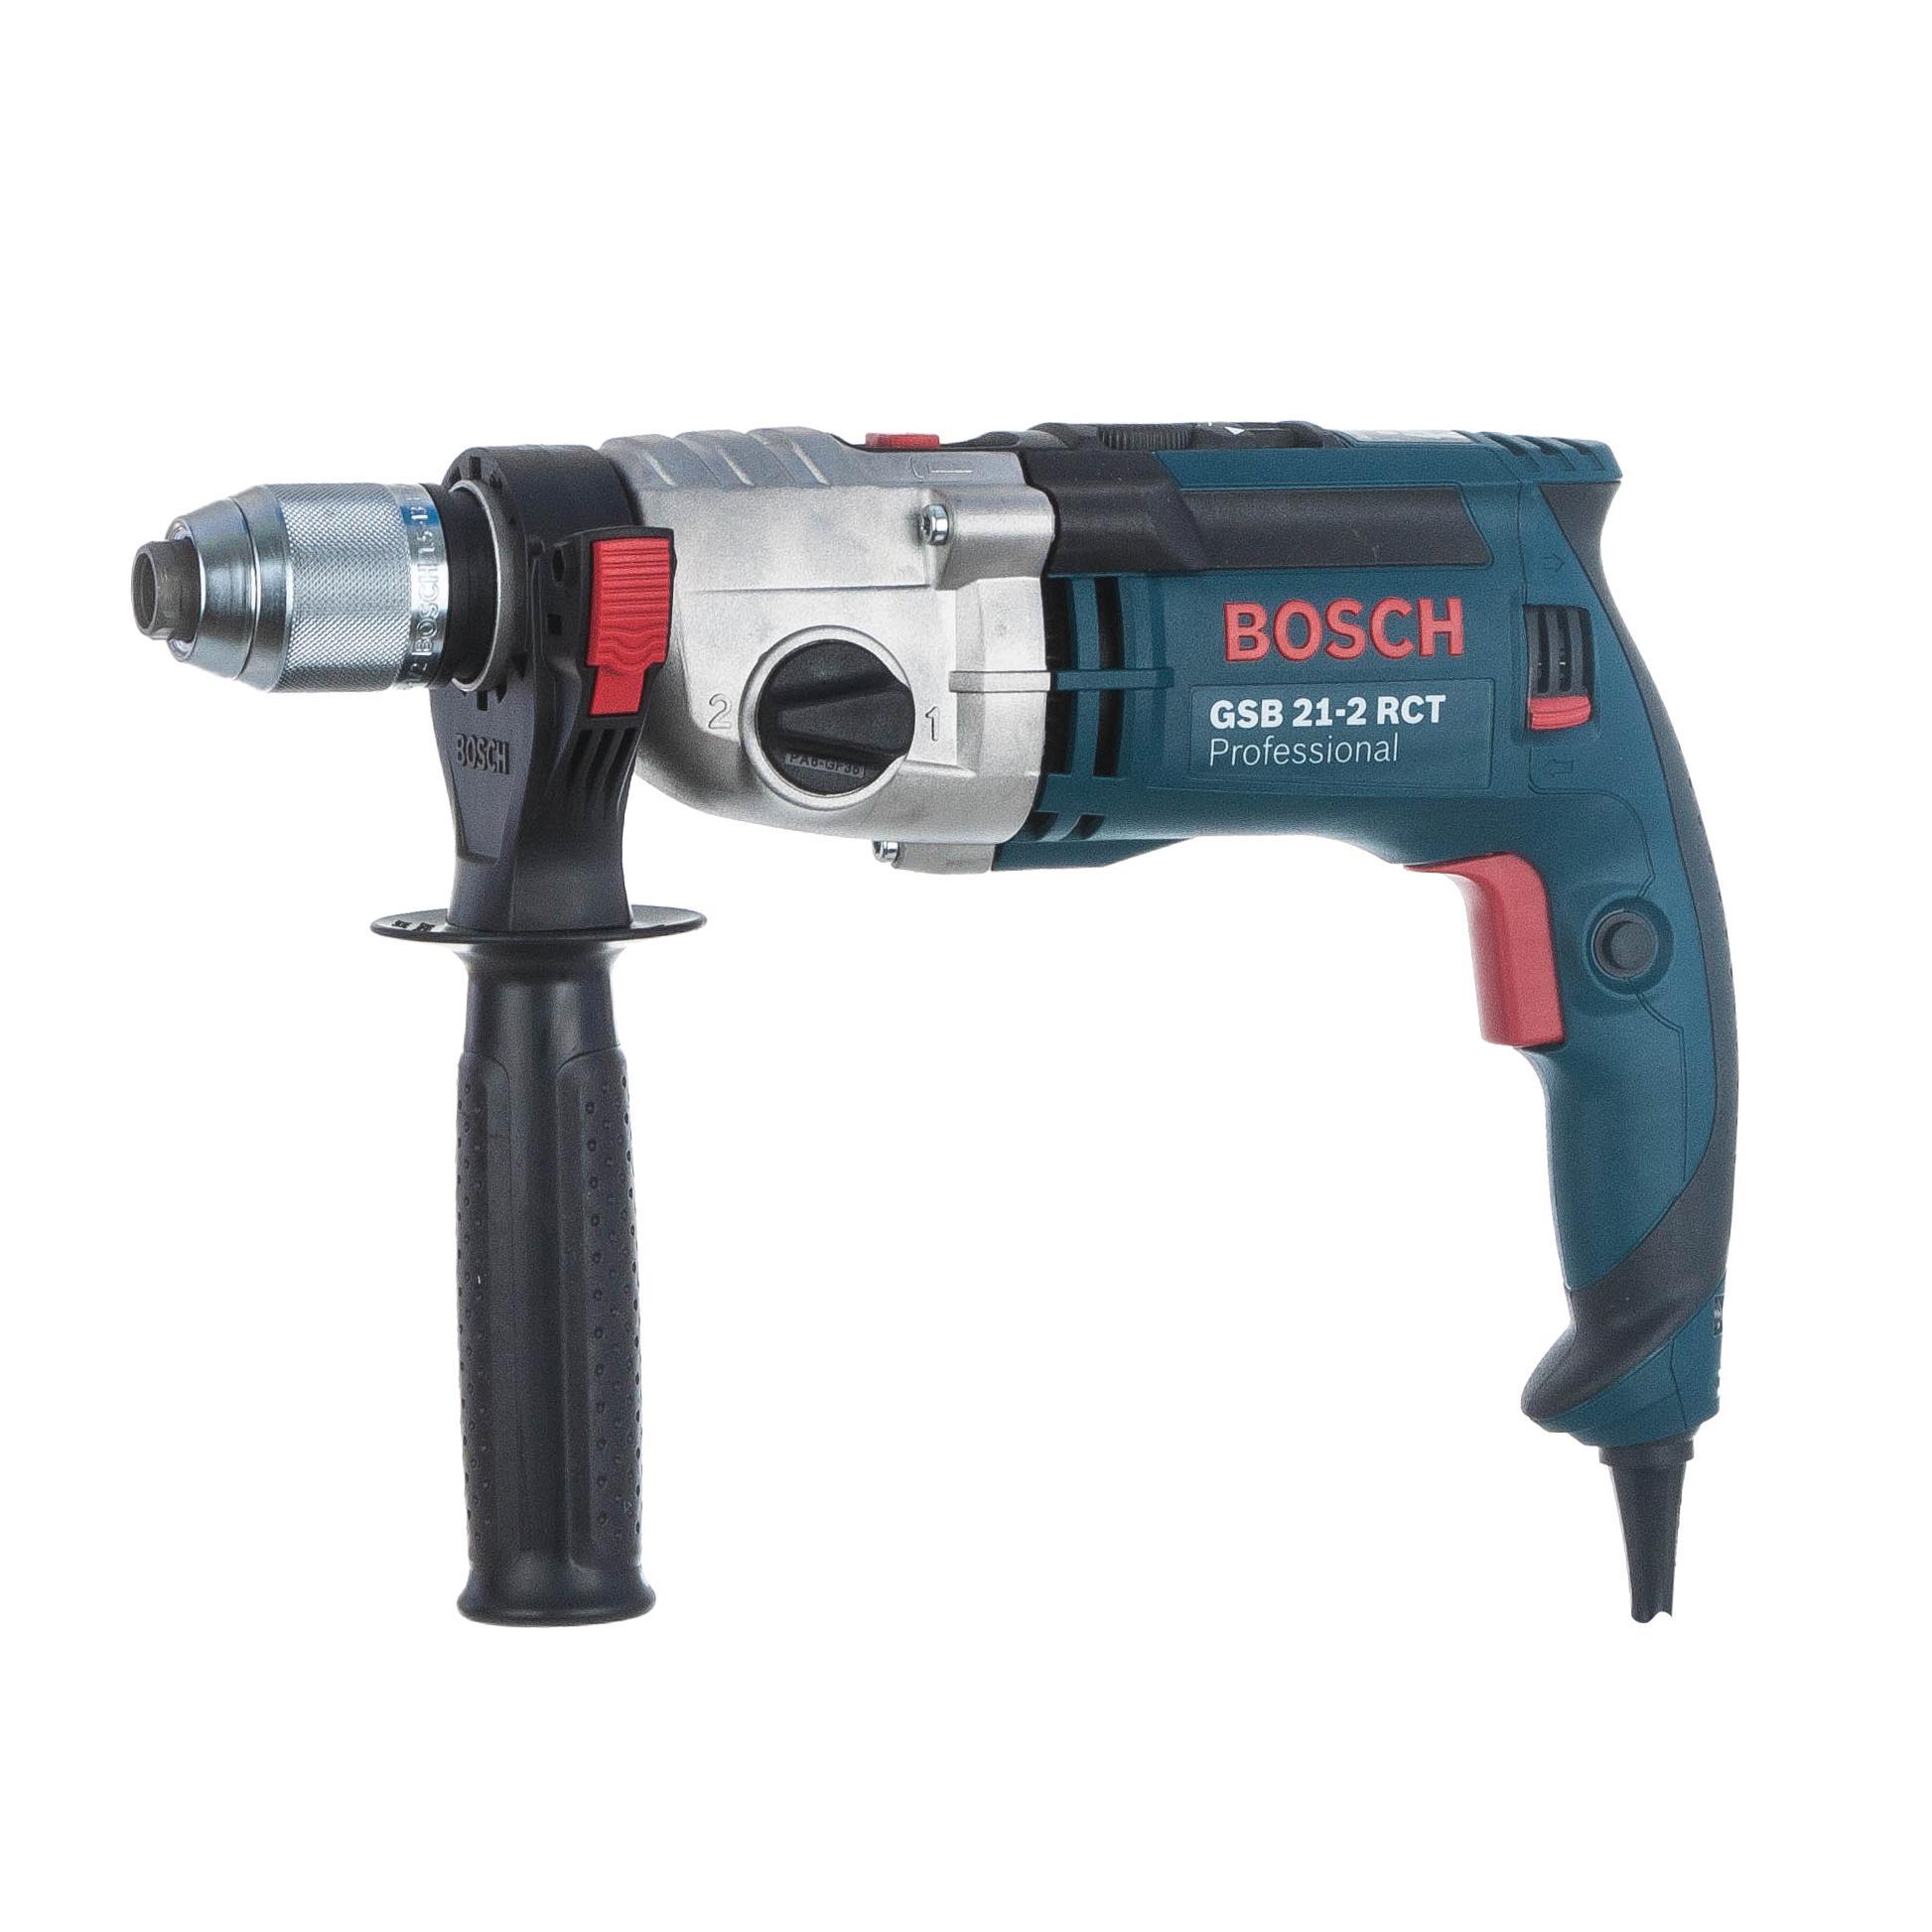 Дрель ударная Bosch Gsb 21-2 rct (0.601.19c.700) replacement for bosch gsb 12 vsp 3 gsb 12vsp 2 gsr 12v bat011 2 607 335 250 2 607 335 376 2 607 335 378 power tools battery